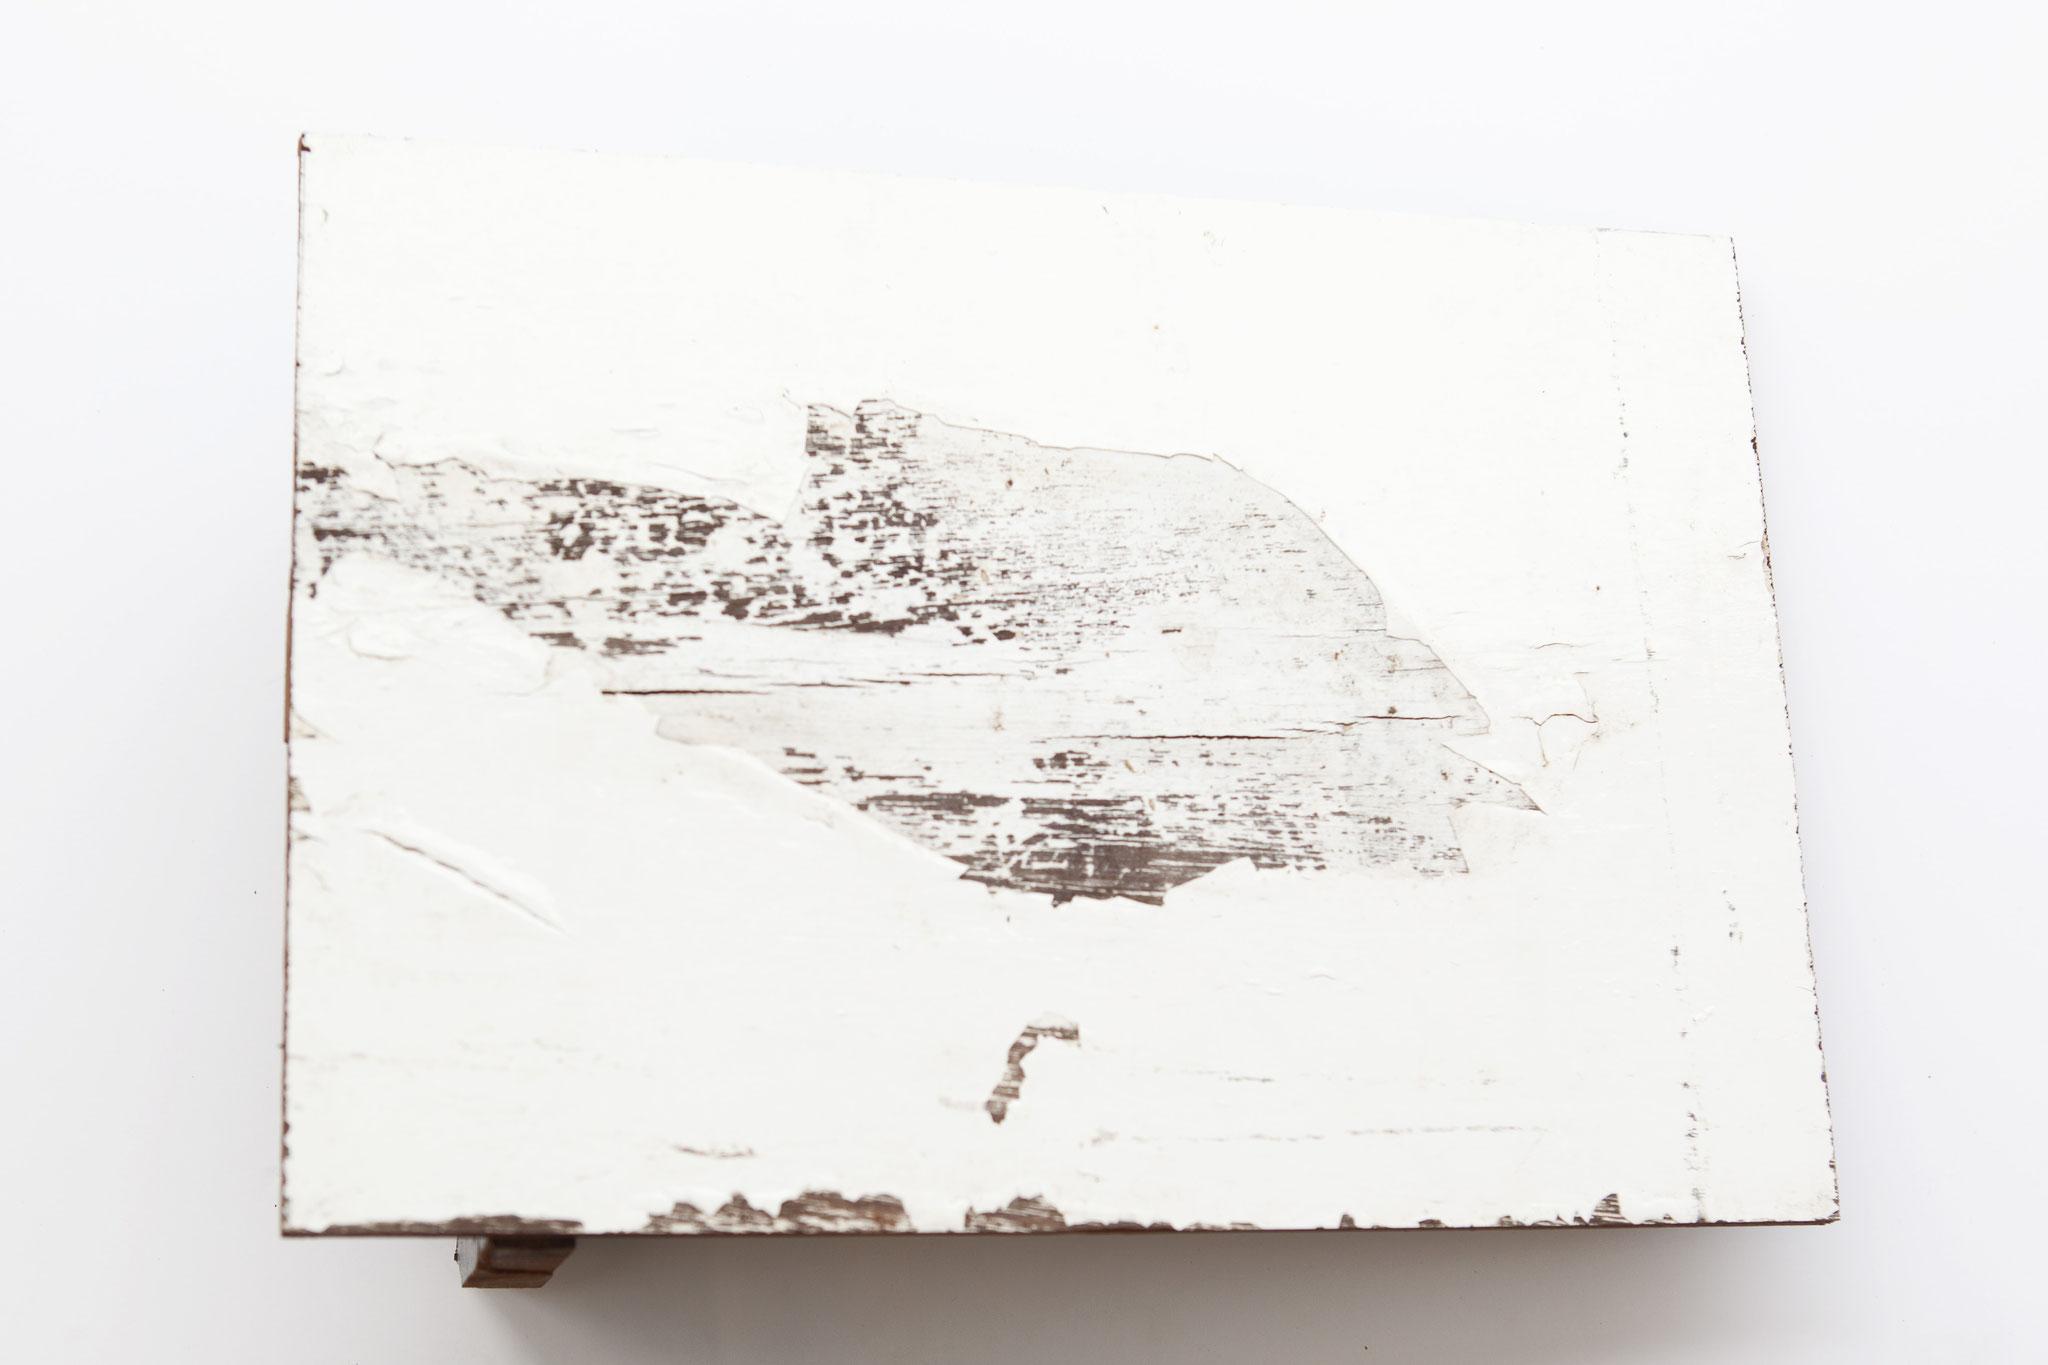 Flotilla 2017 20 x 30 cm 3/20 €250,-